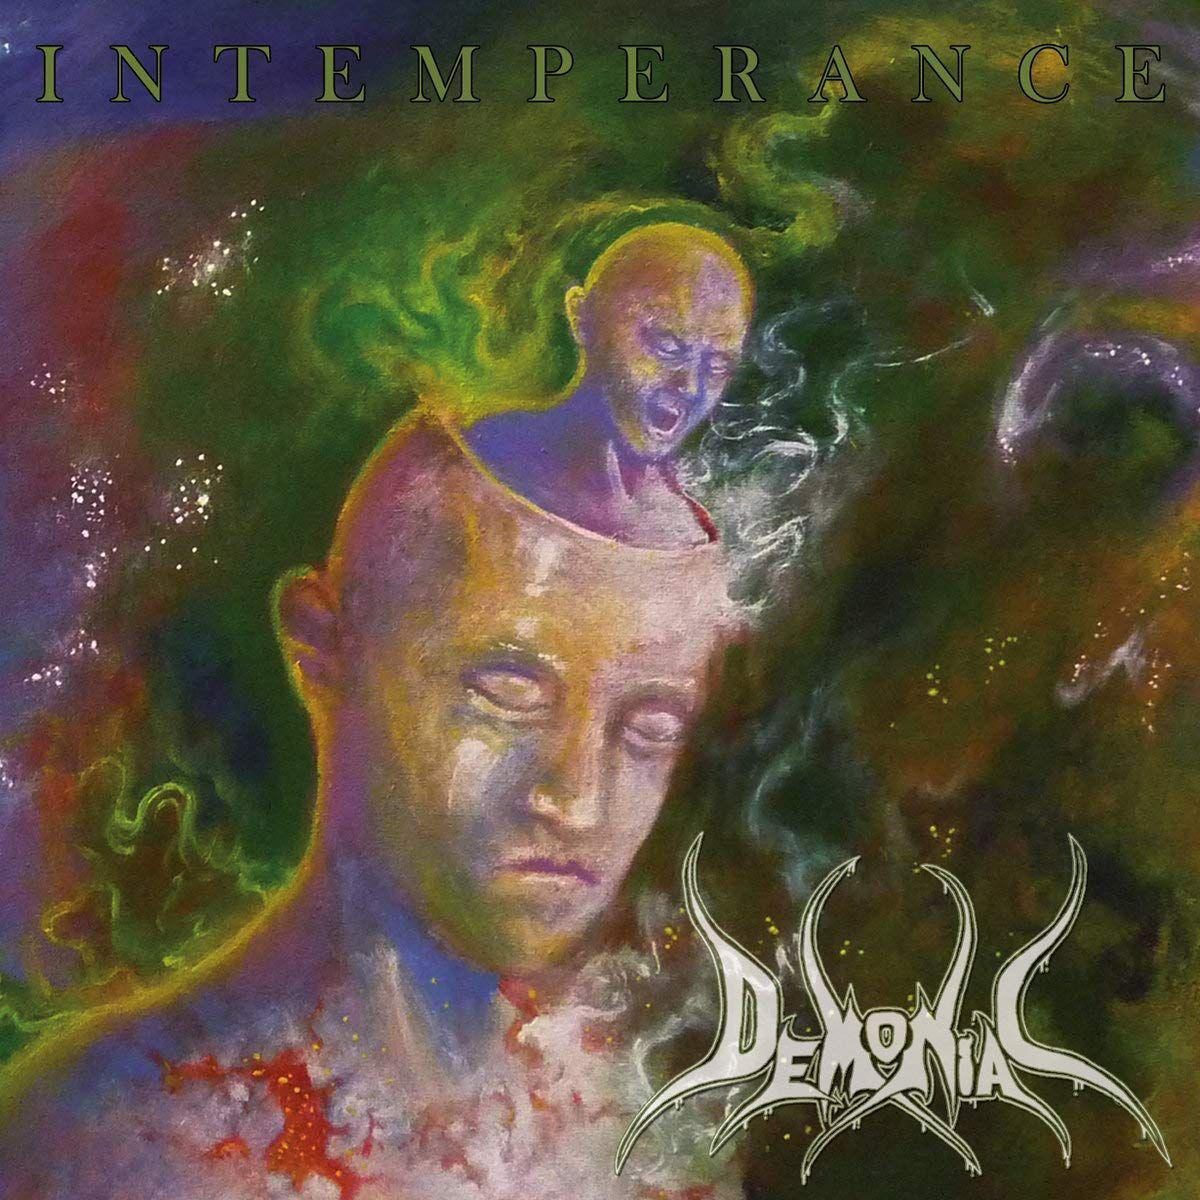 Demoniac (CHL) - Intemperance